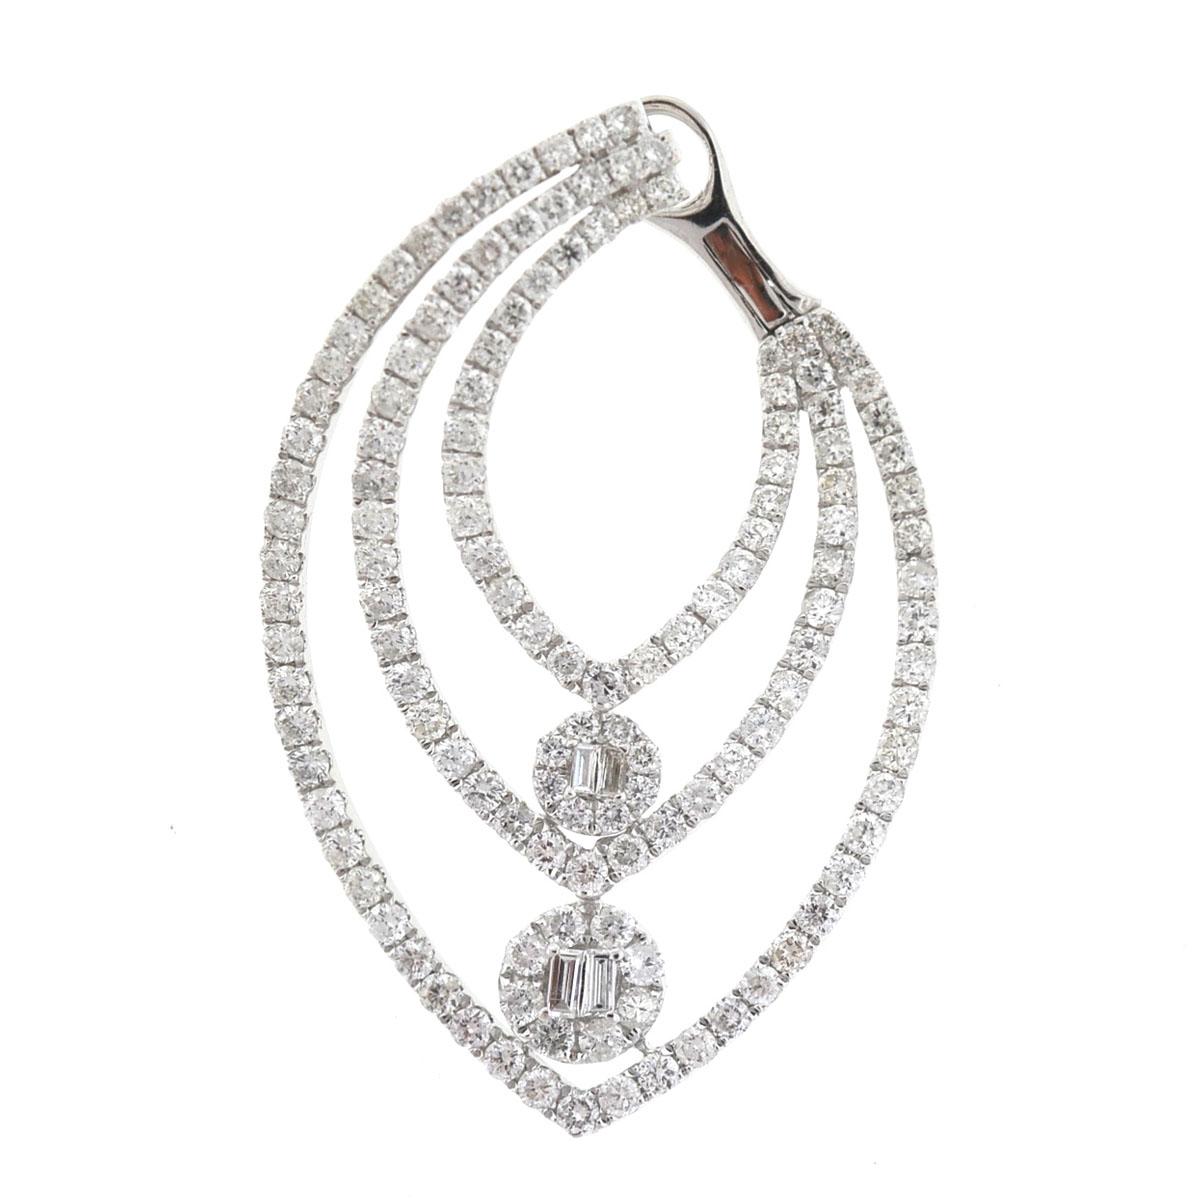 18k White Gold Three Row Prong Set Diamond Earrings